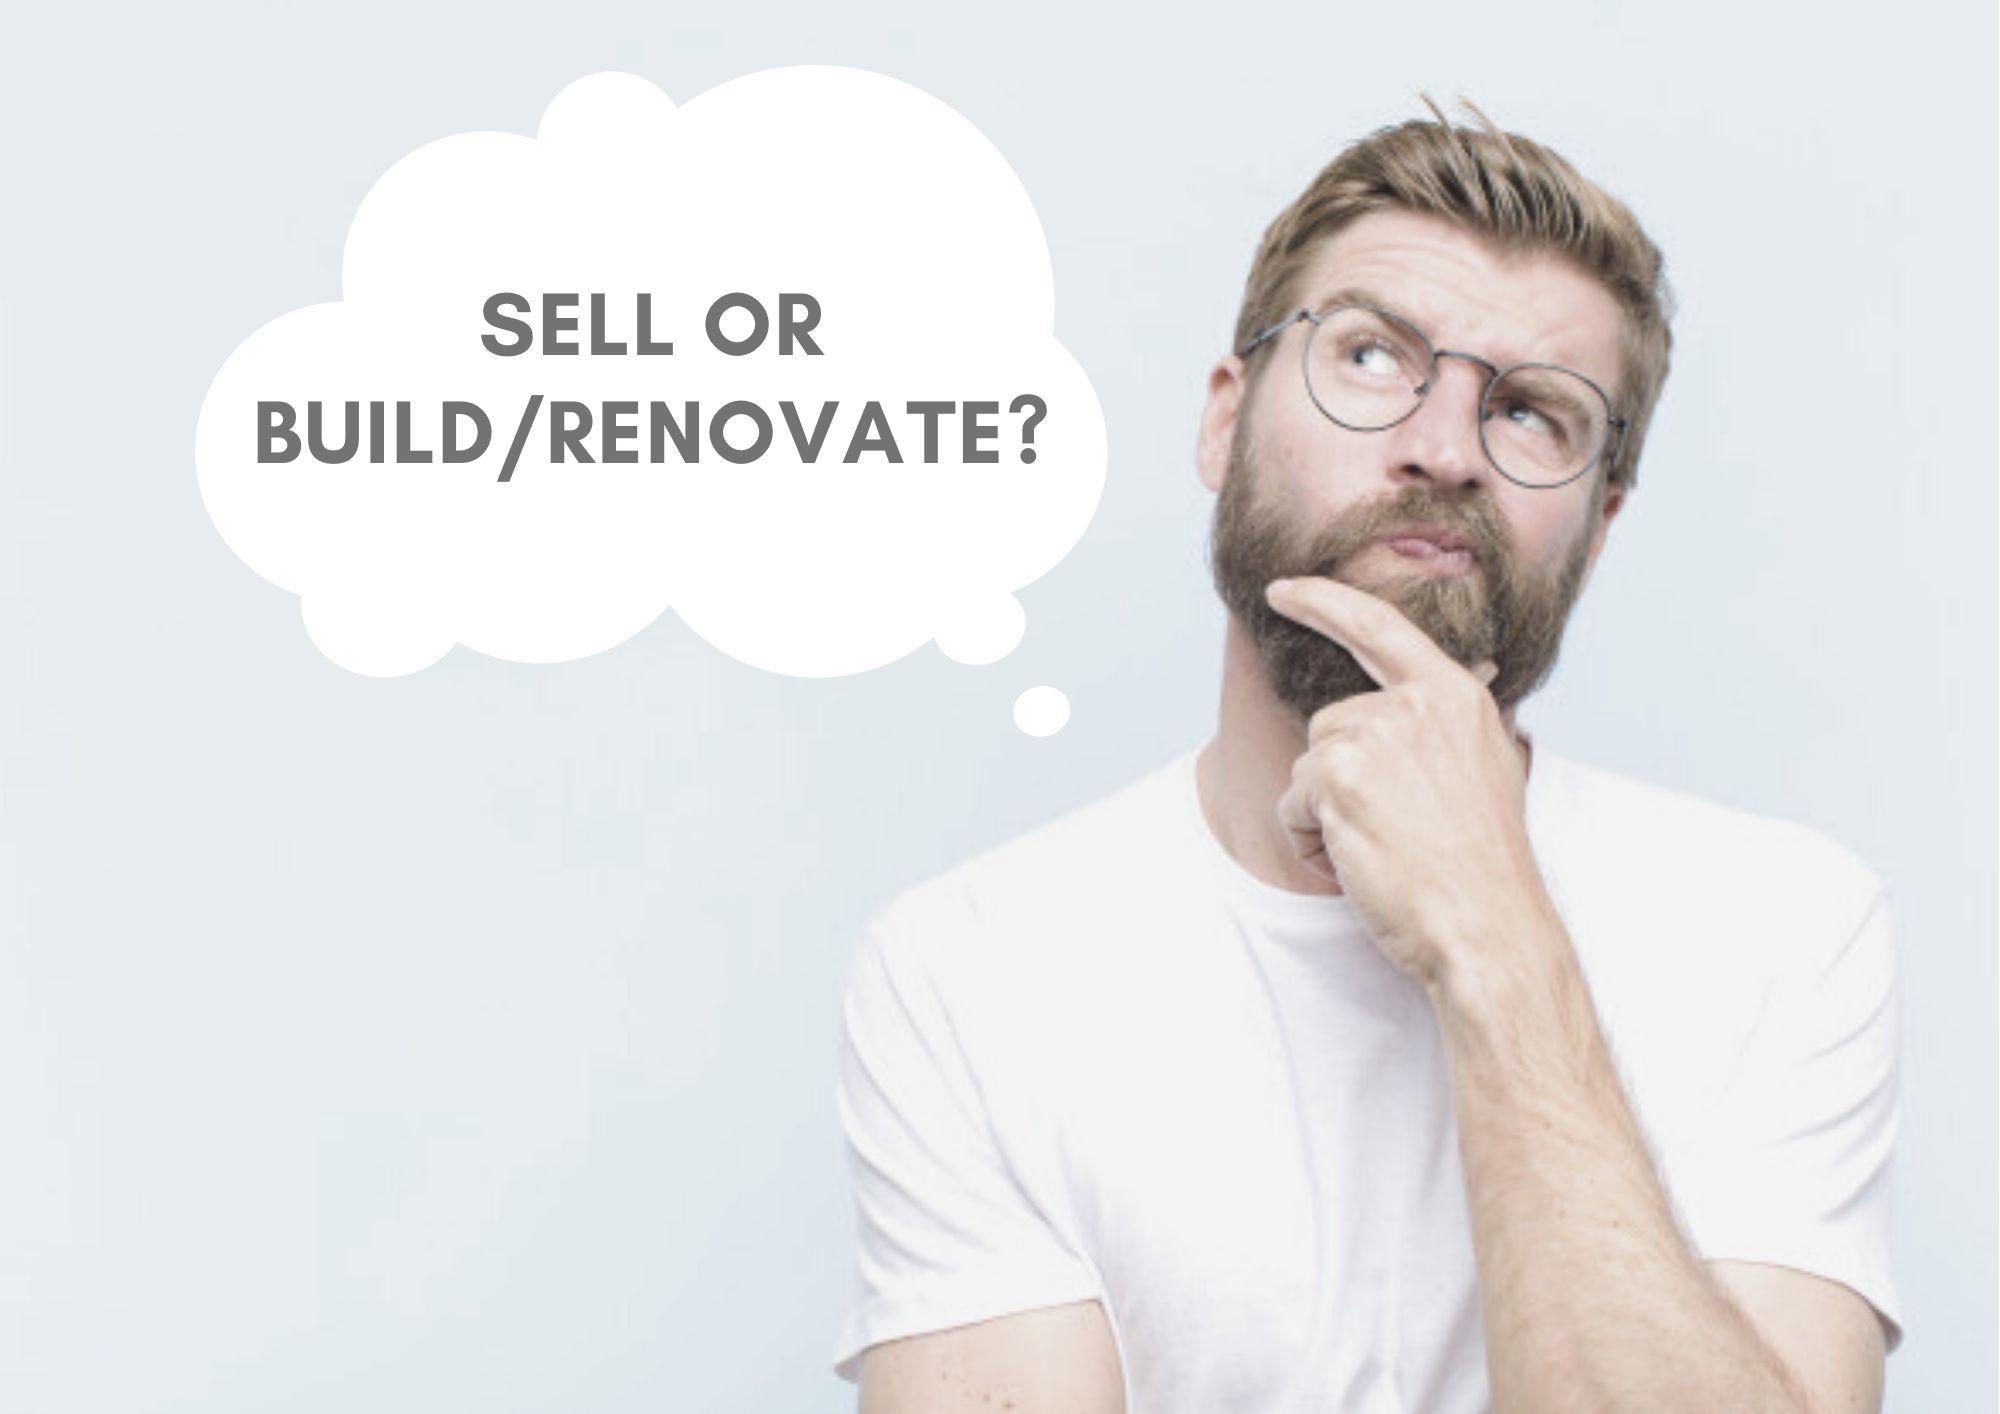 https://assets.boxdice.com.au/laguna/attachments/fcb/8a9/sell_or_renovate_.jpg?4e9b6fe9e908cab3f3a737554406209b